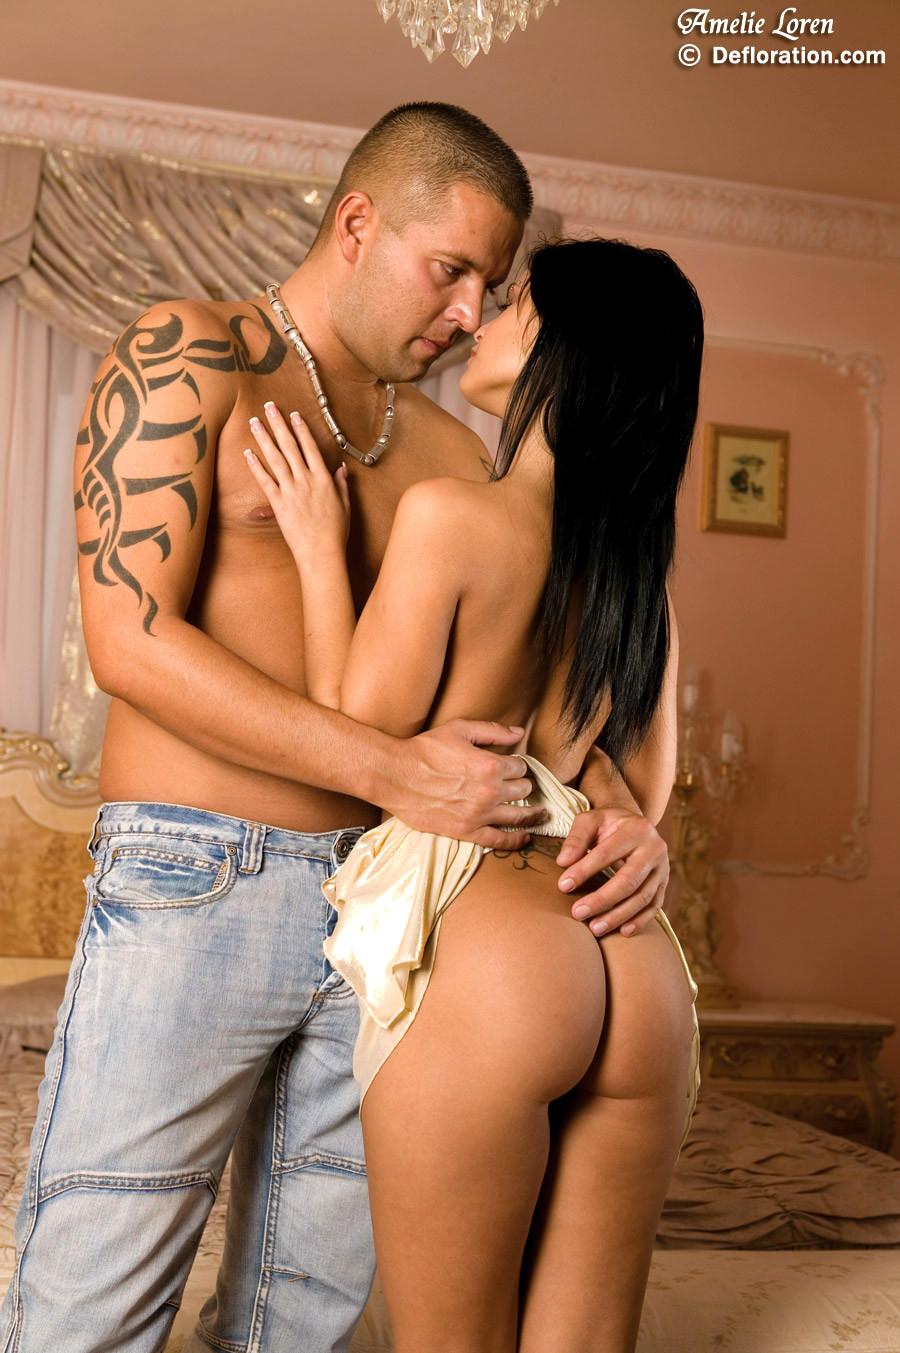 juliette lewis nude images